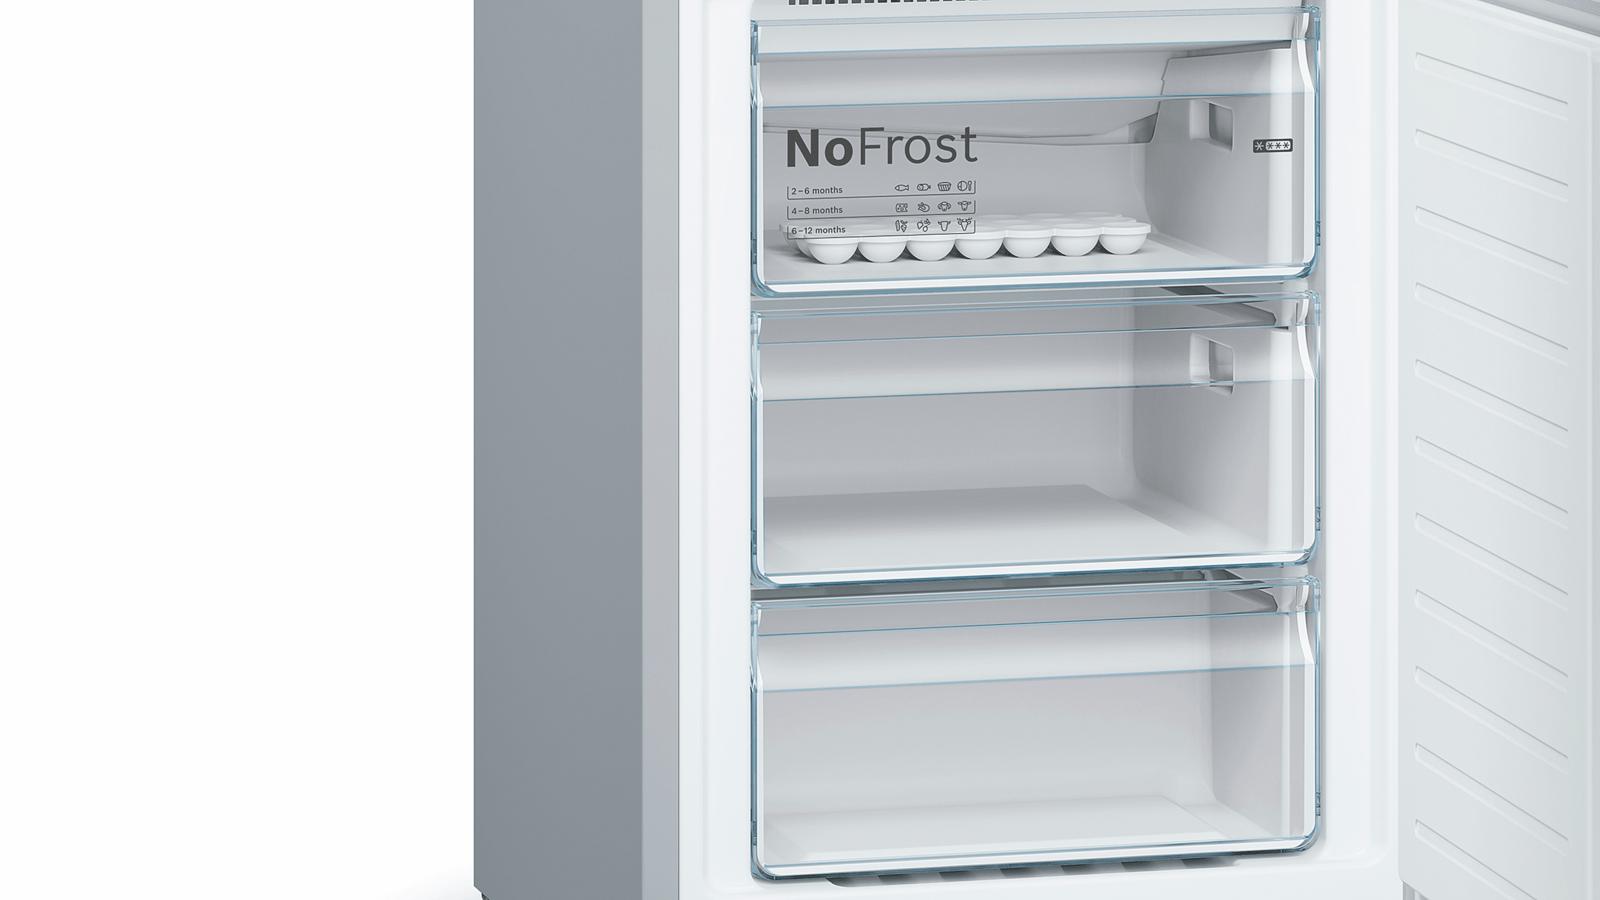 Refrigerateur Americain Faible Largeur serie | 4 free-standing fridge-freezer with freezer at bottom 203 x 60 cm  inox antifingerprint kgn39vi35